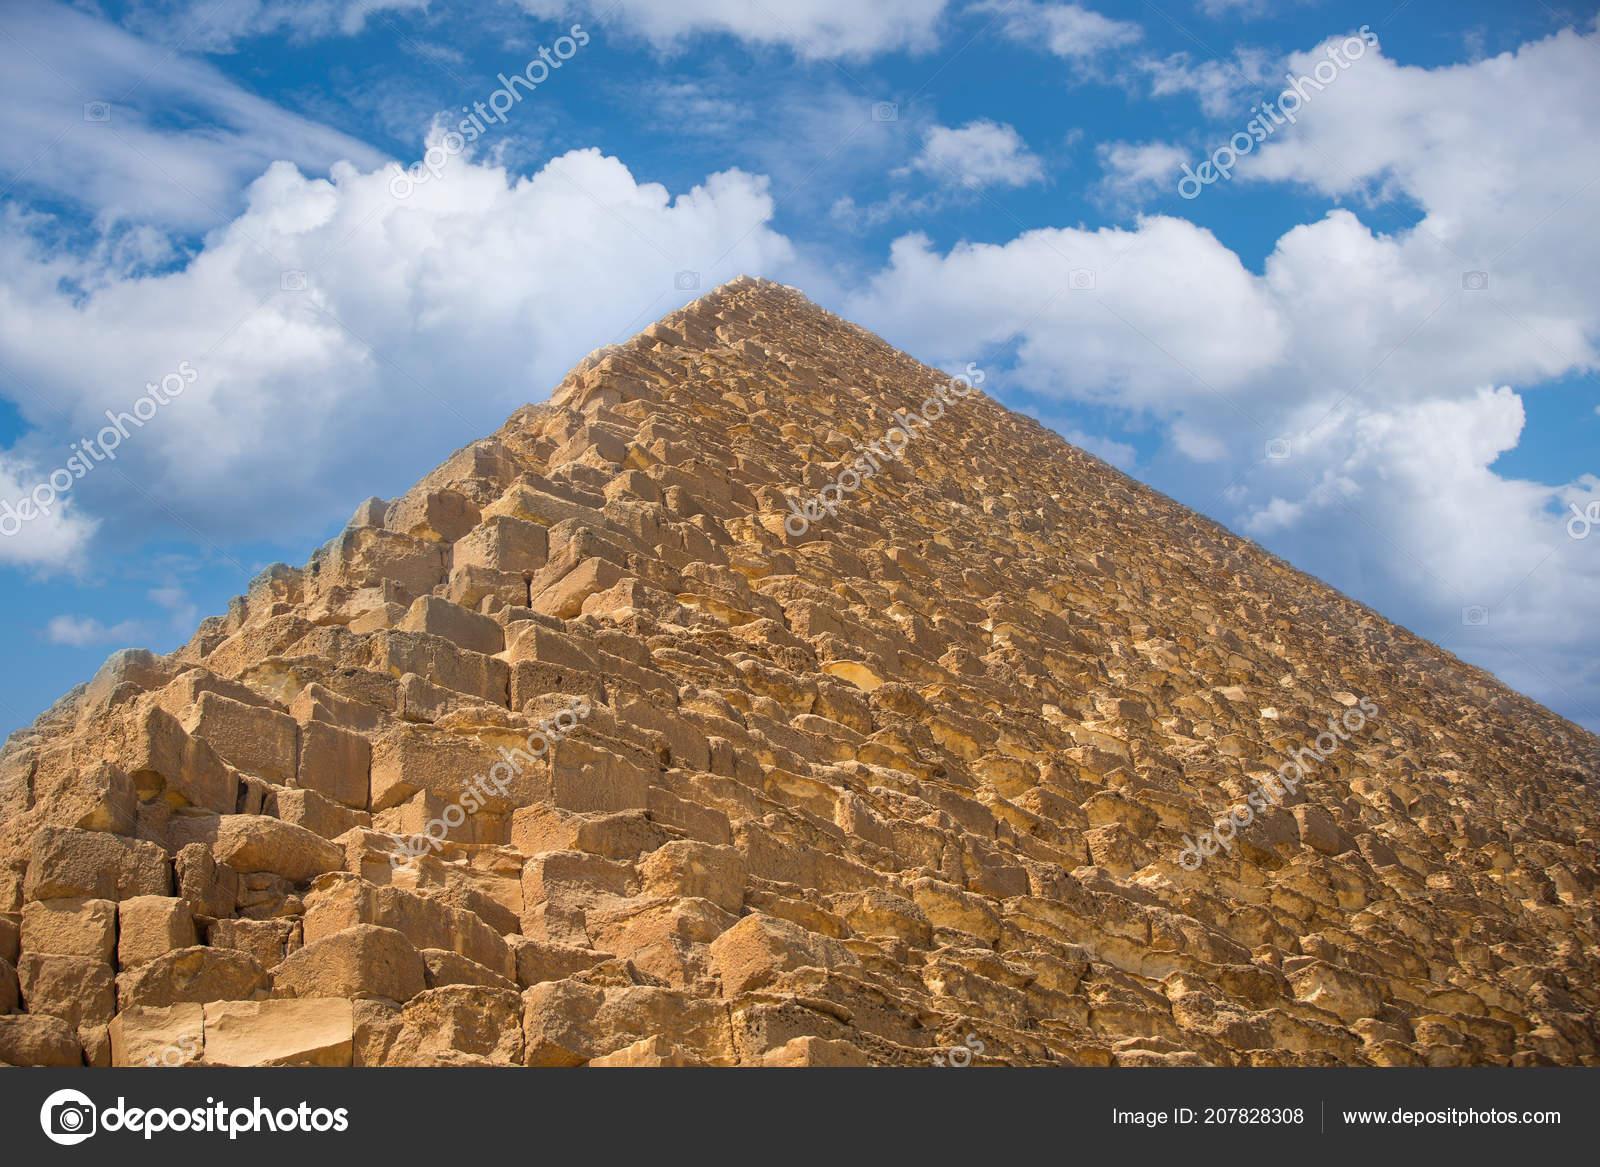 Image Great Pyramids Giza Egypt — Stock Photo © Lindrik #207828308